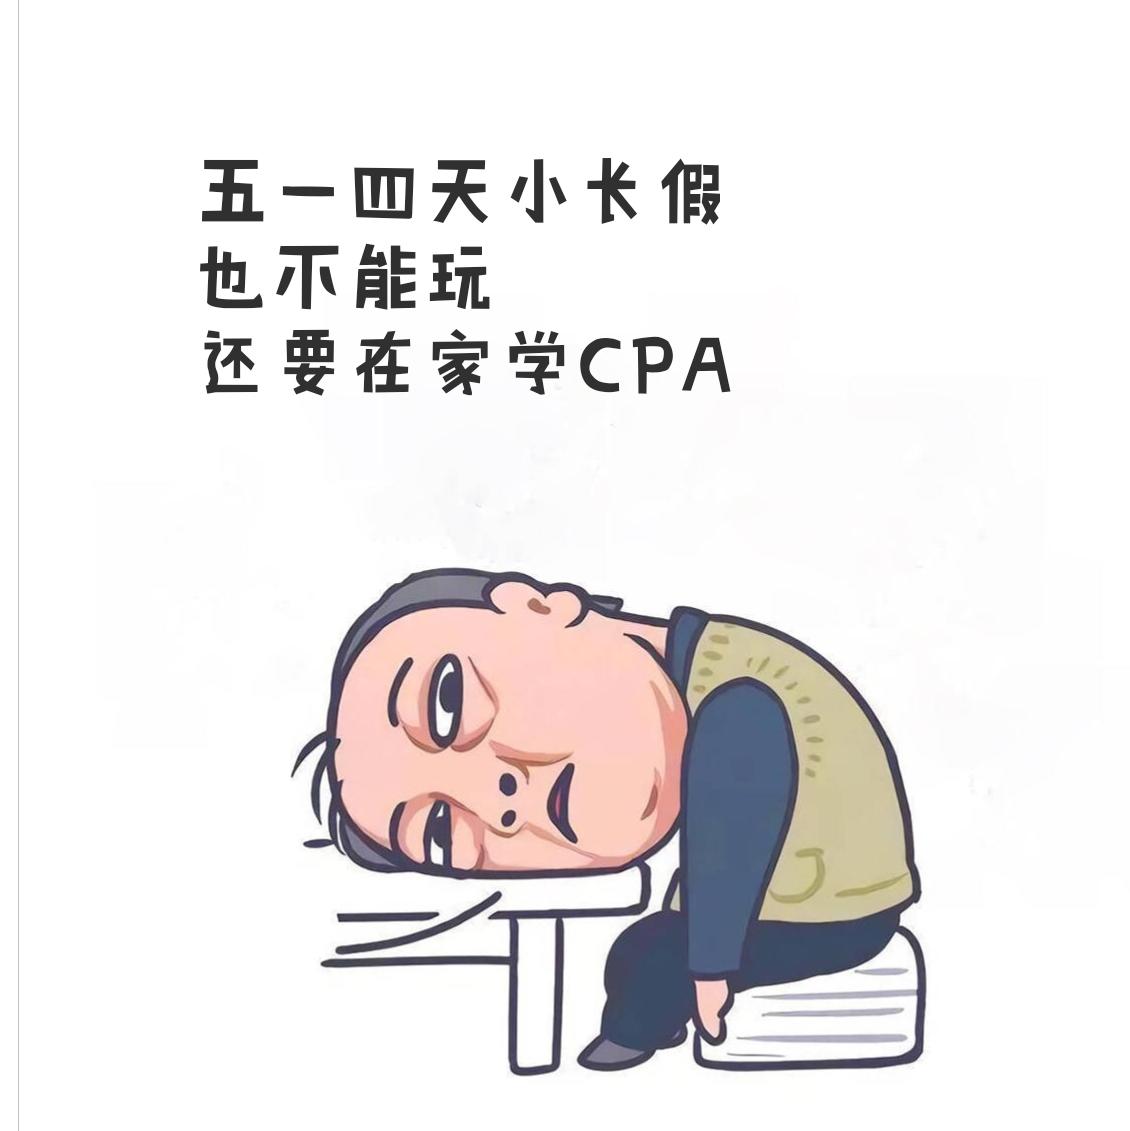 2019cpa图片